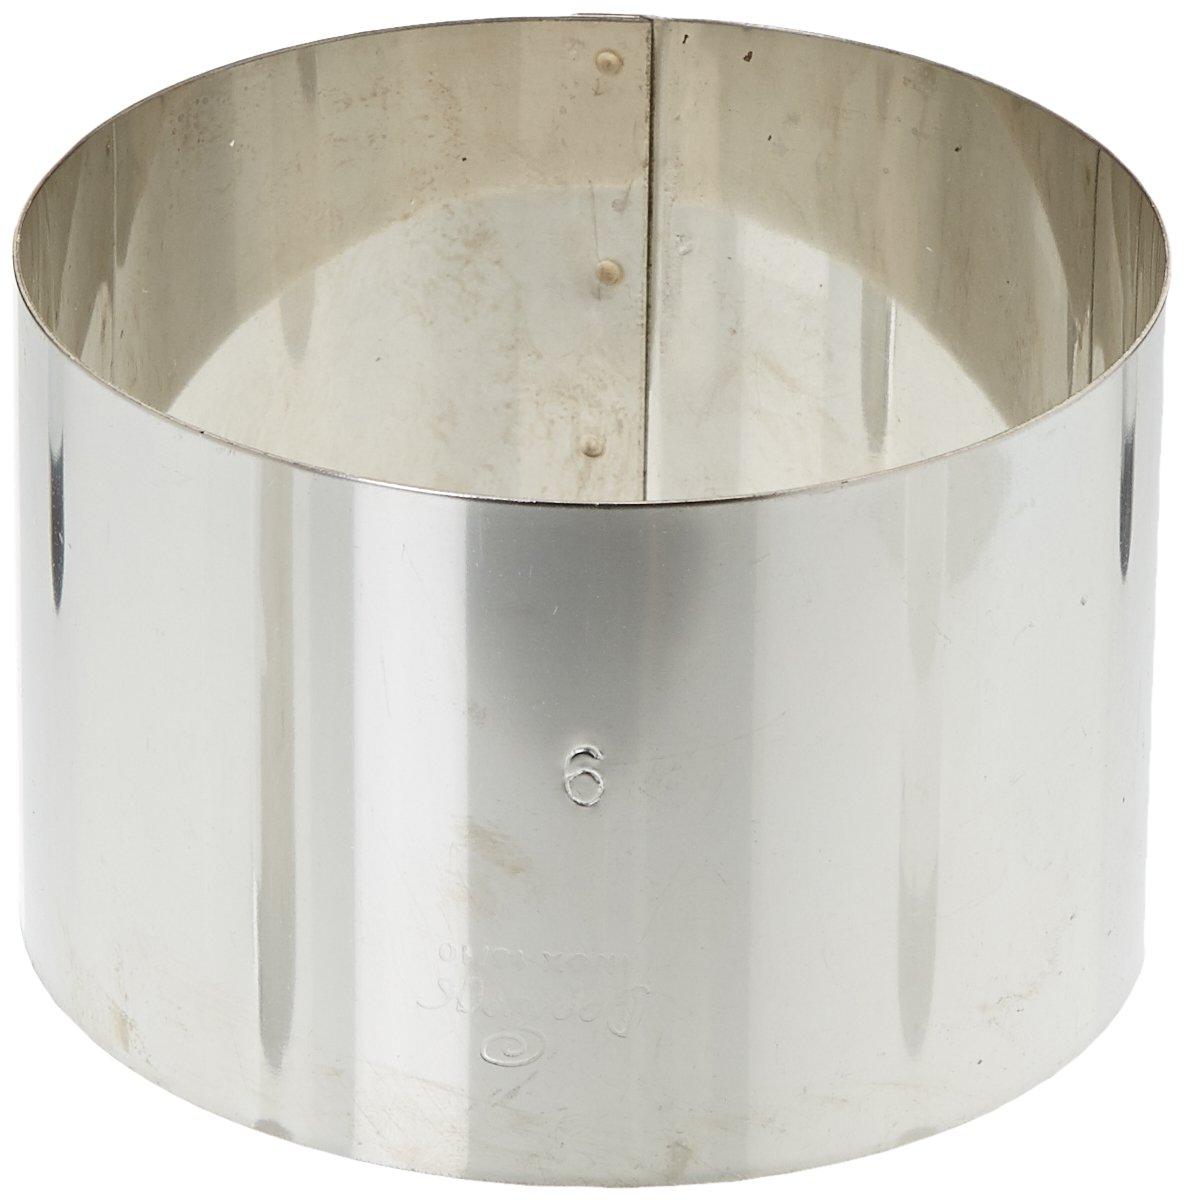 DECORA 0063705 Cerchio Inox 4 x 3 cm, Acciaio Inossidabile, Argento teglie; stampi